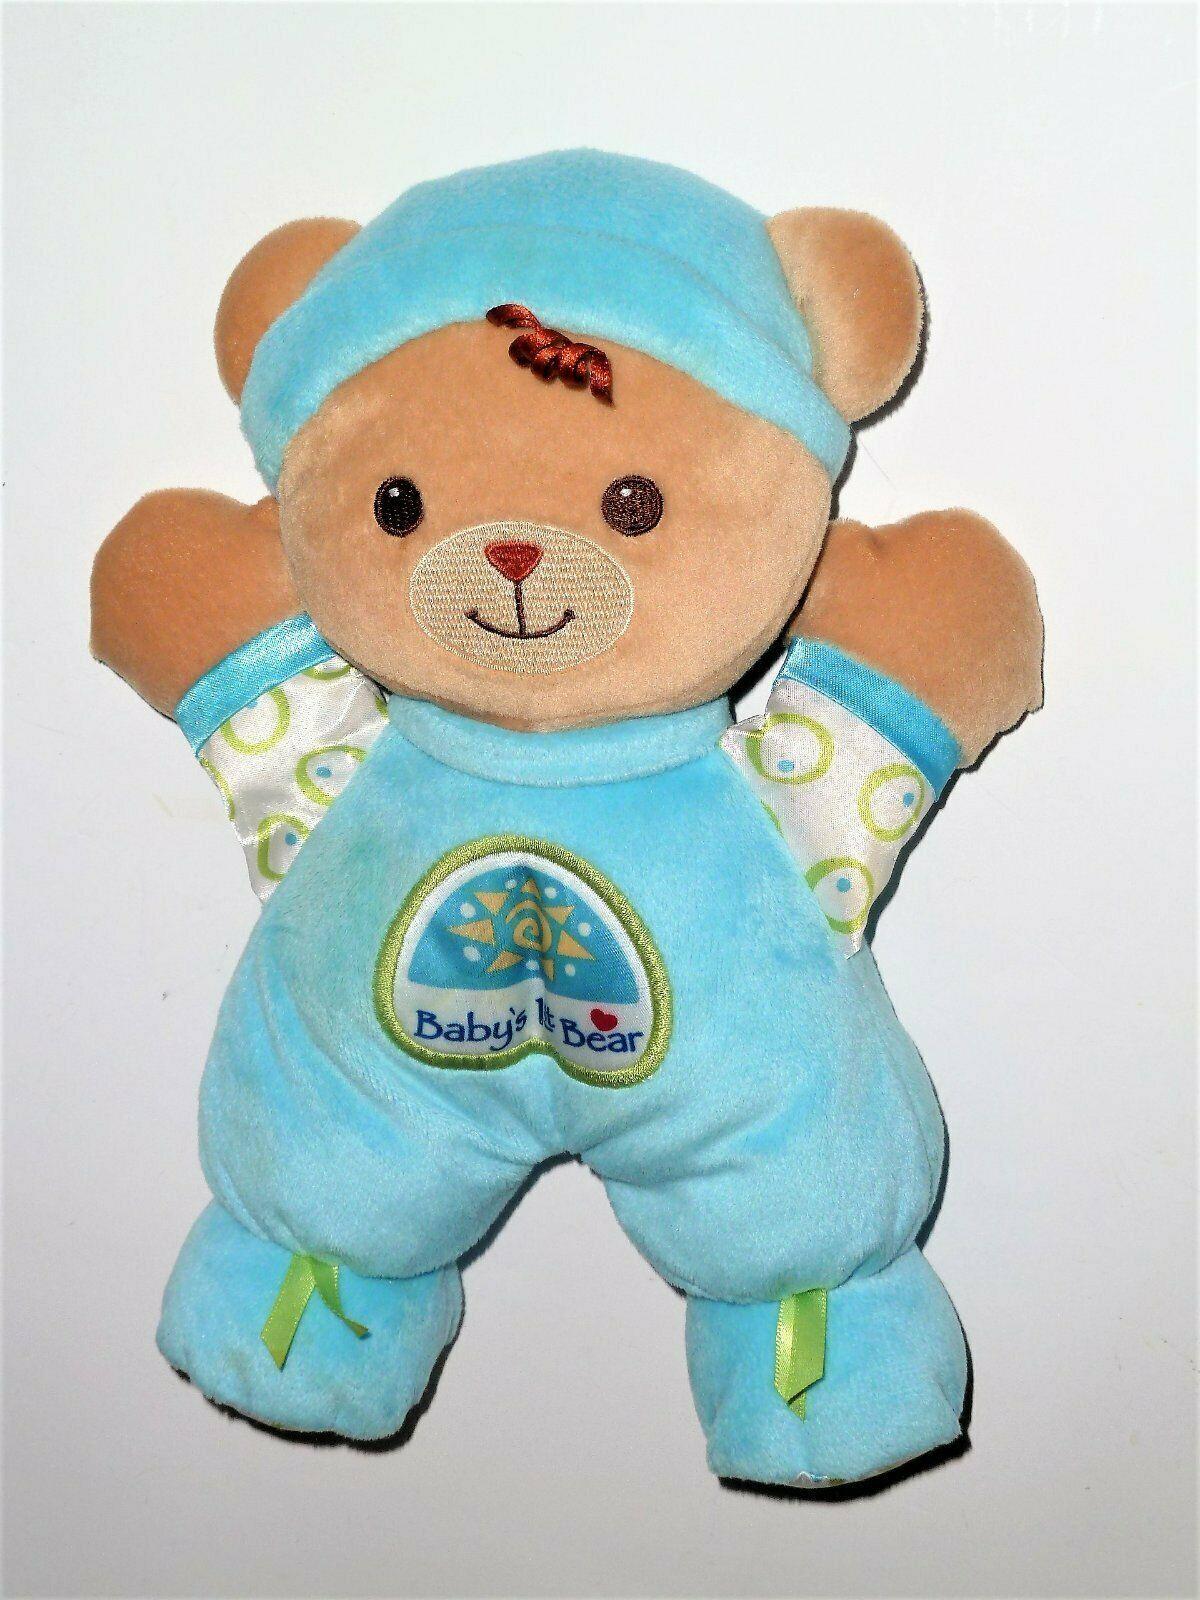 "FISHER PRICE BABY'S 1ST BEAR RATTLE DOLL AQUA BLUE 11"" - $6.97"